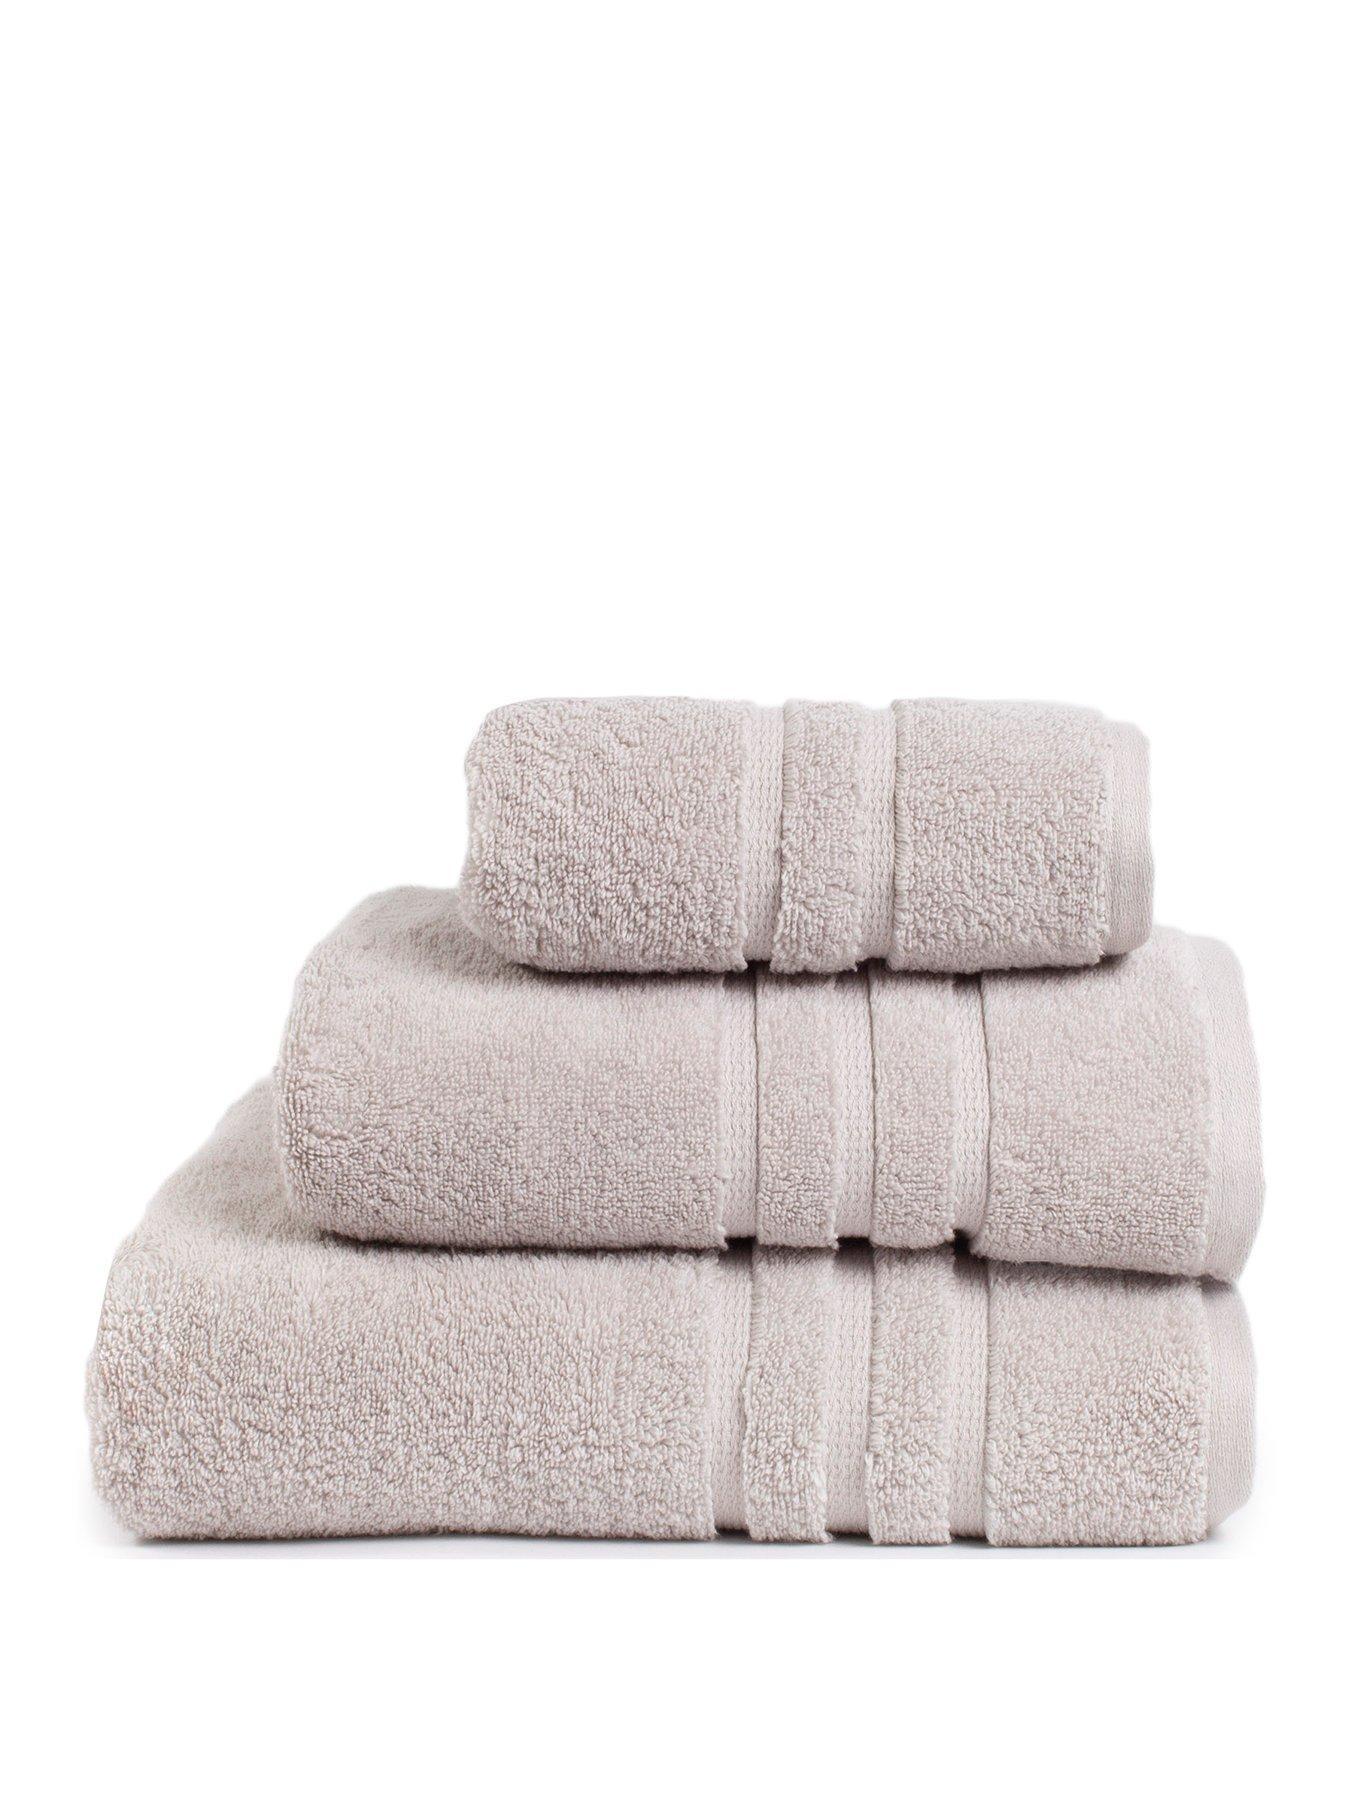 Luxury 100/%  Egyptian cotton super soft 600 GSM towels hand bath towel sheet